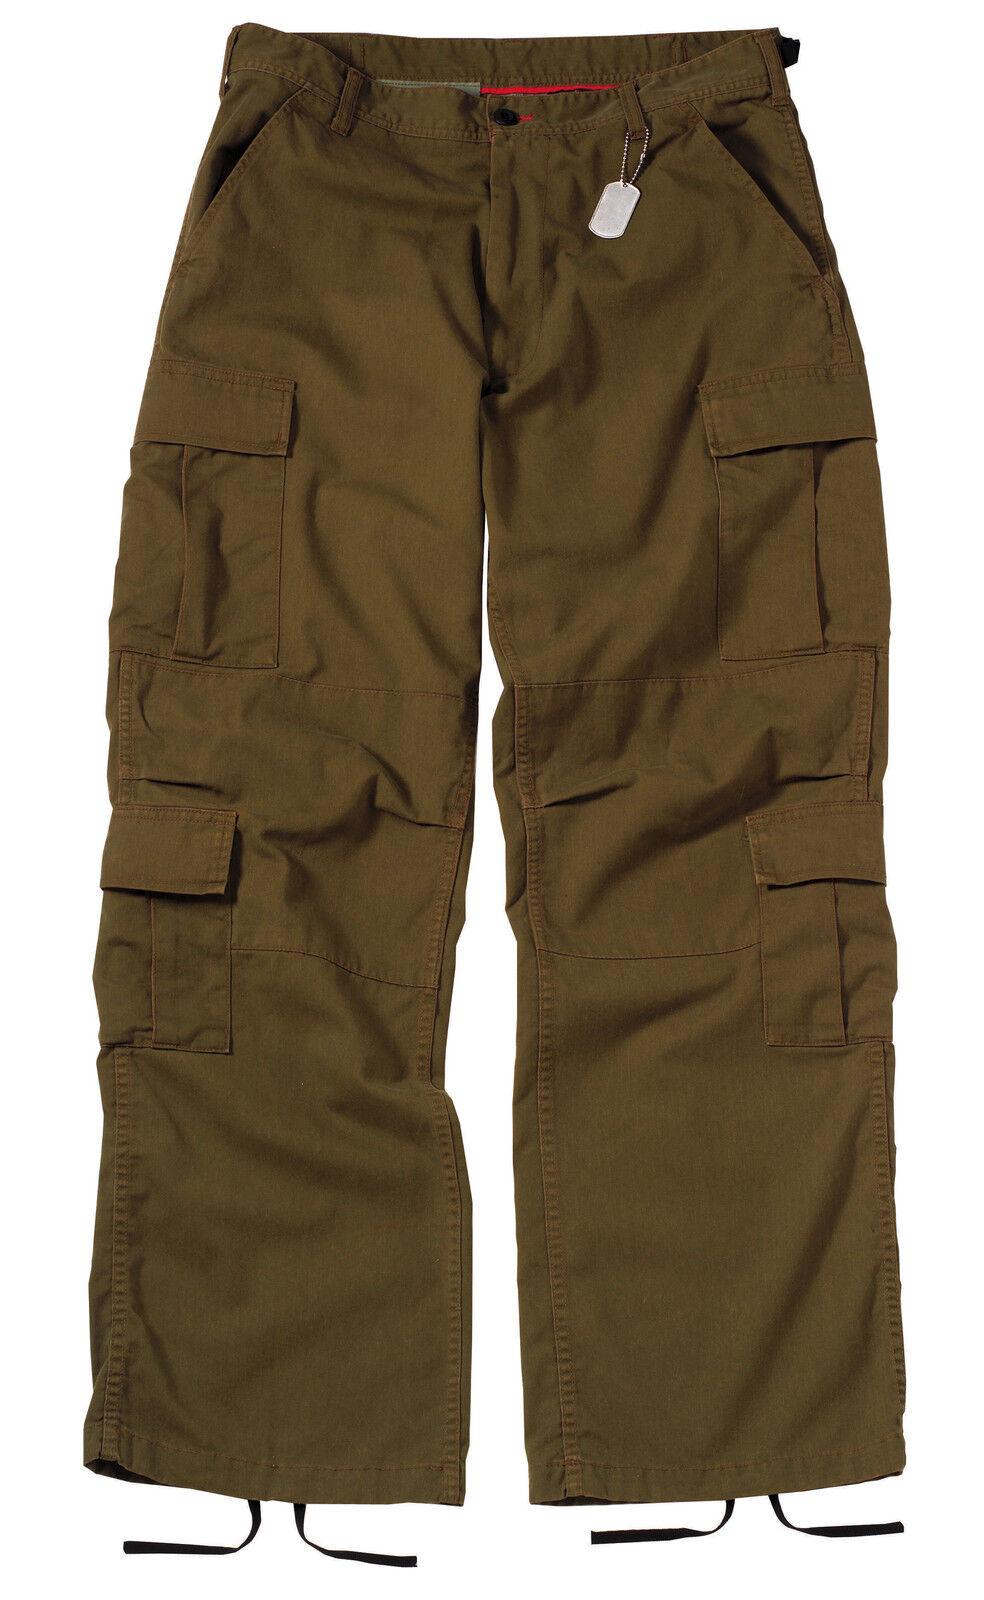 Vintage Russet Brown Paratrooper Cargo Pants BDU XS-3XL